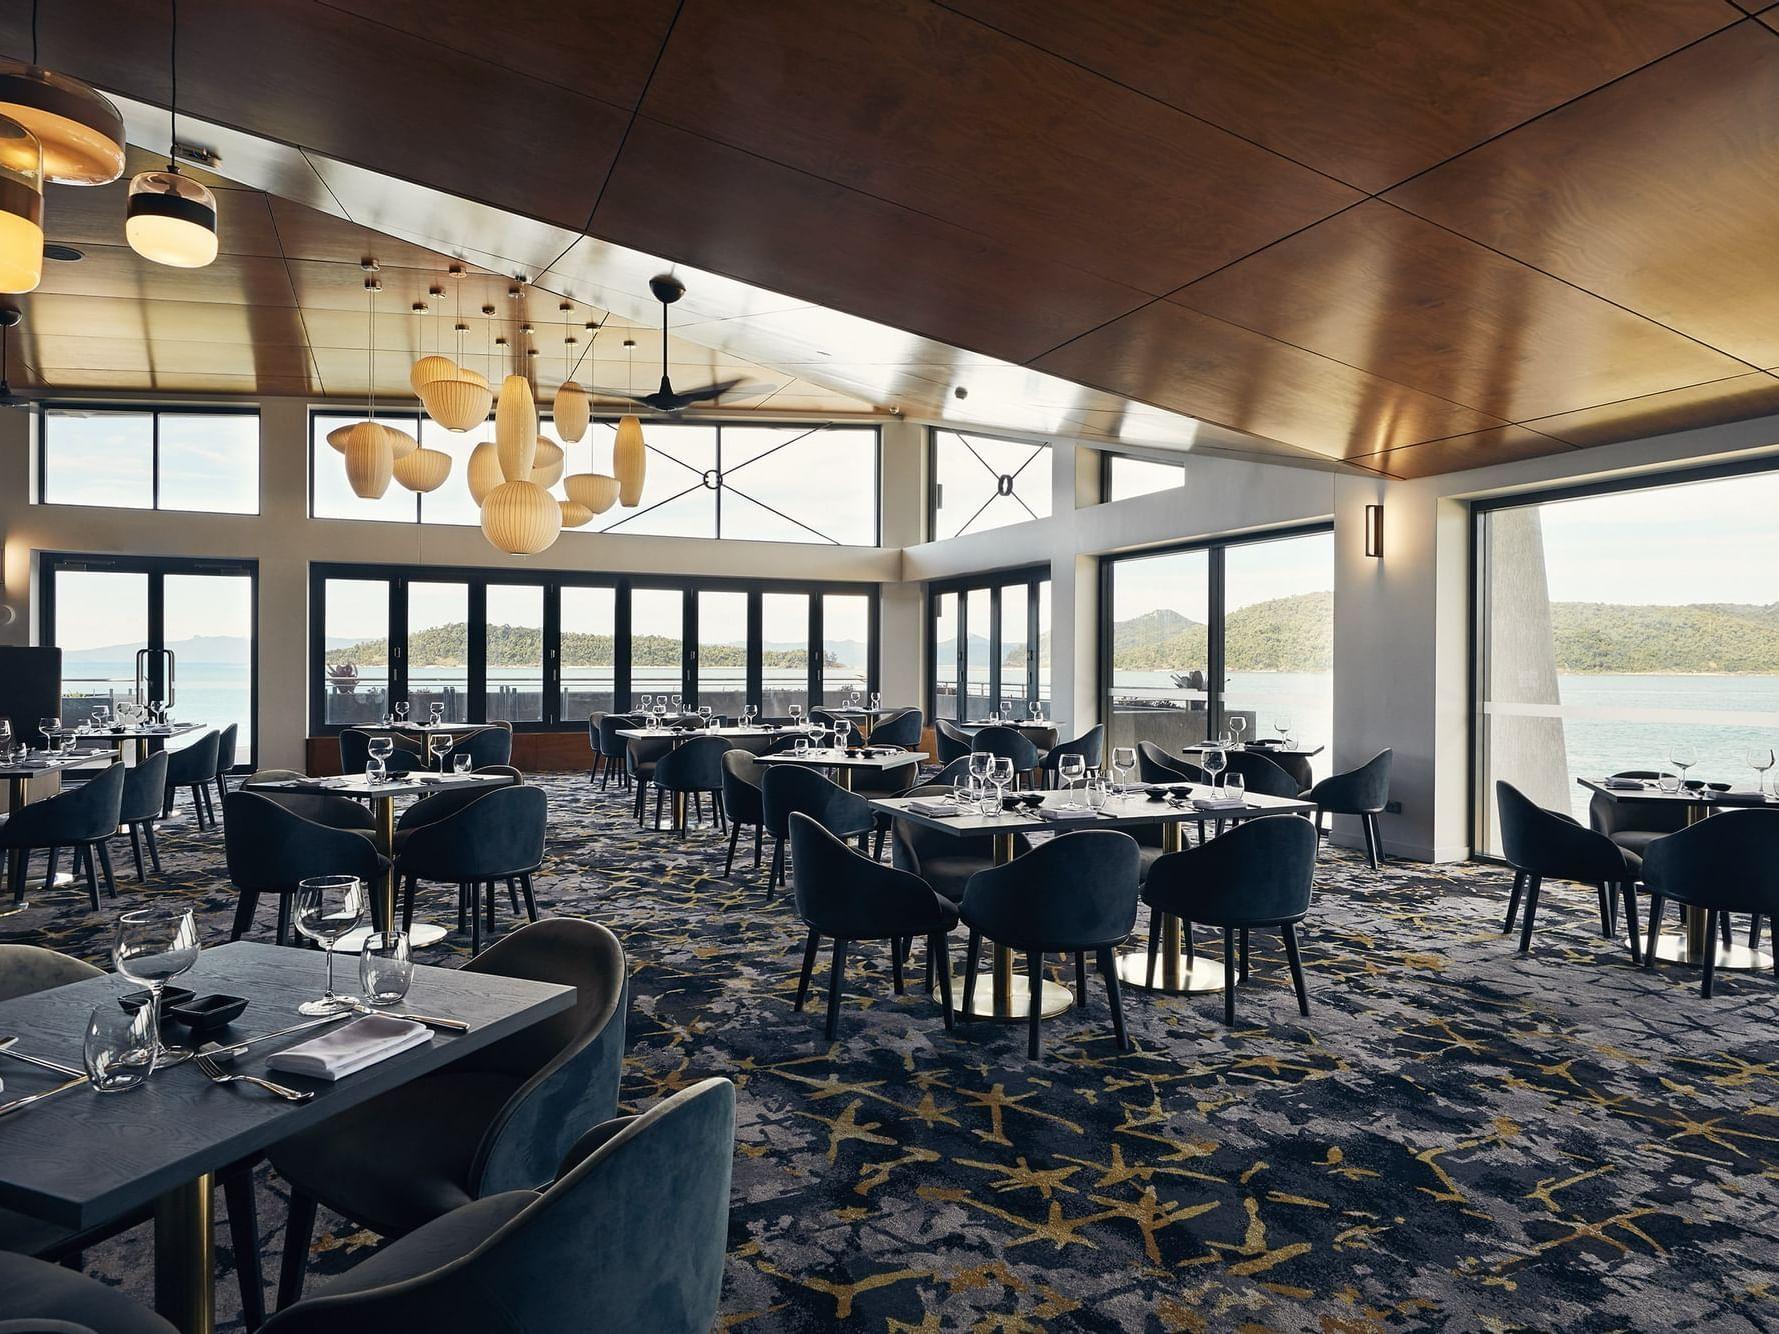 Arranged table in Infinity Restaurant at Daydream Island Resort